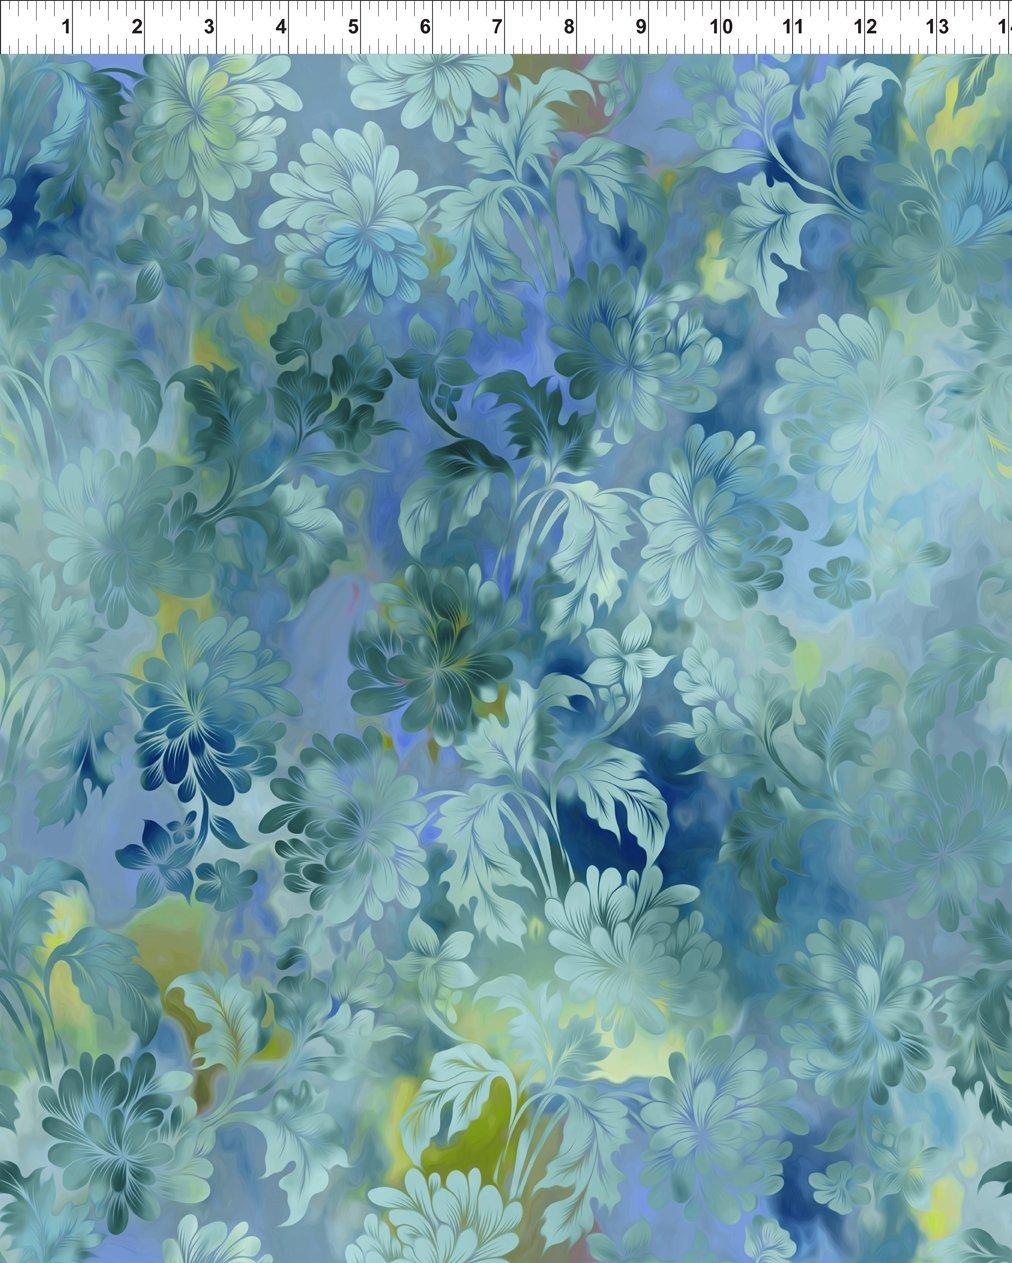 Diaphanous - colorwashed aqua flowers on blue